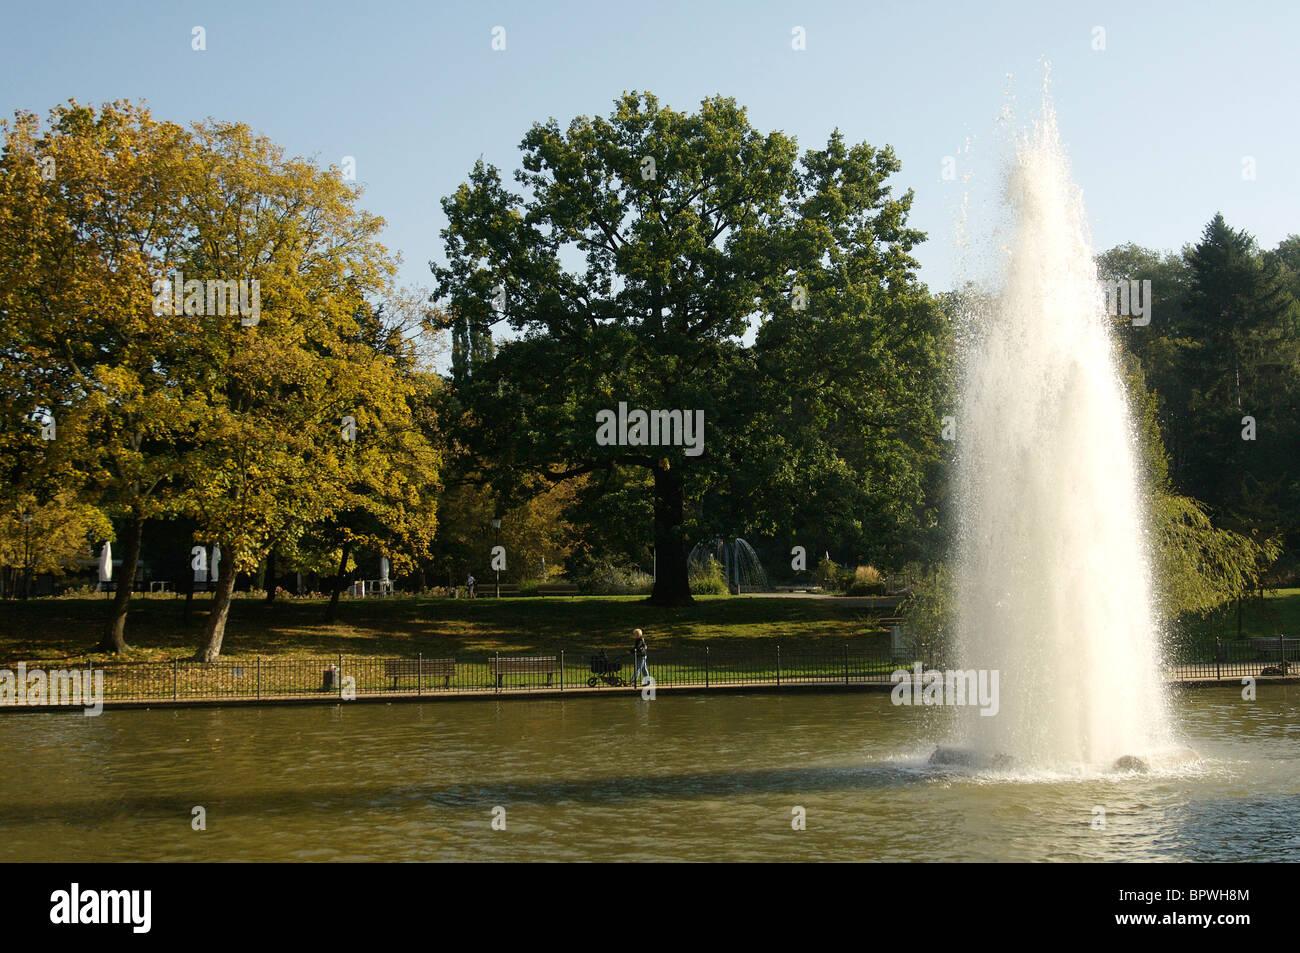 Fountain in the lake at Volkspark Friedrichshain park in Berlin - Stock Image